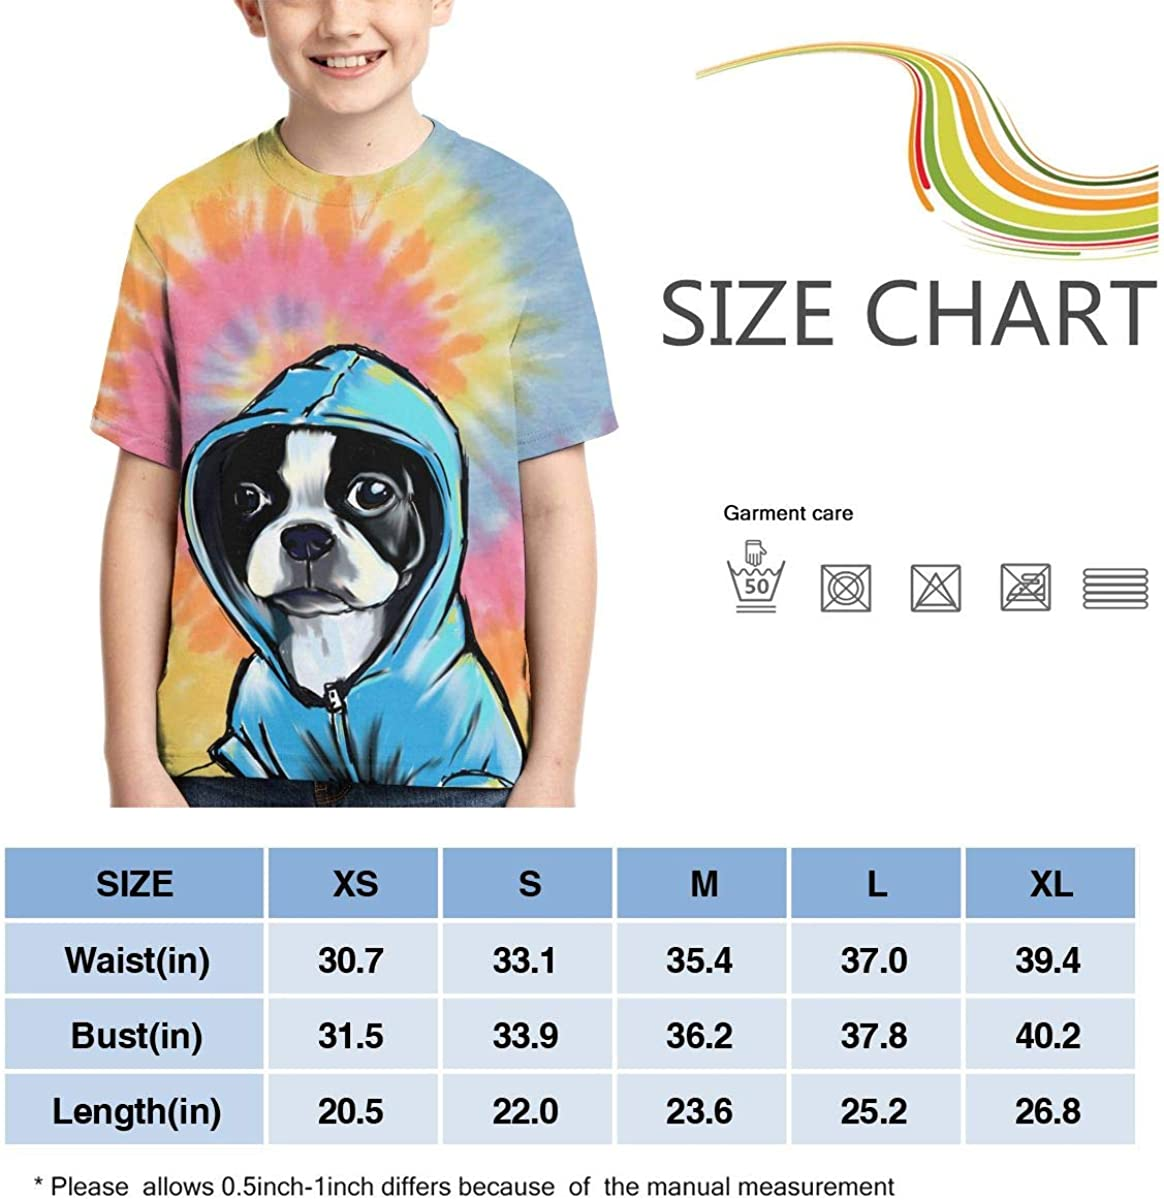 CERTONGCXTS Little Boys Cute Narwhal Cute Short Sleeve T-Shirt Size 2-6